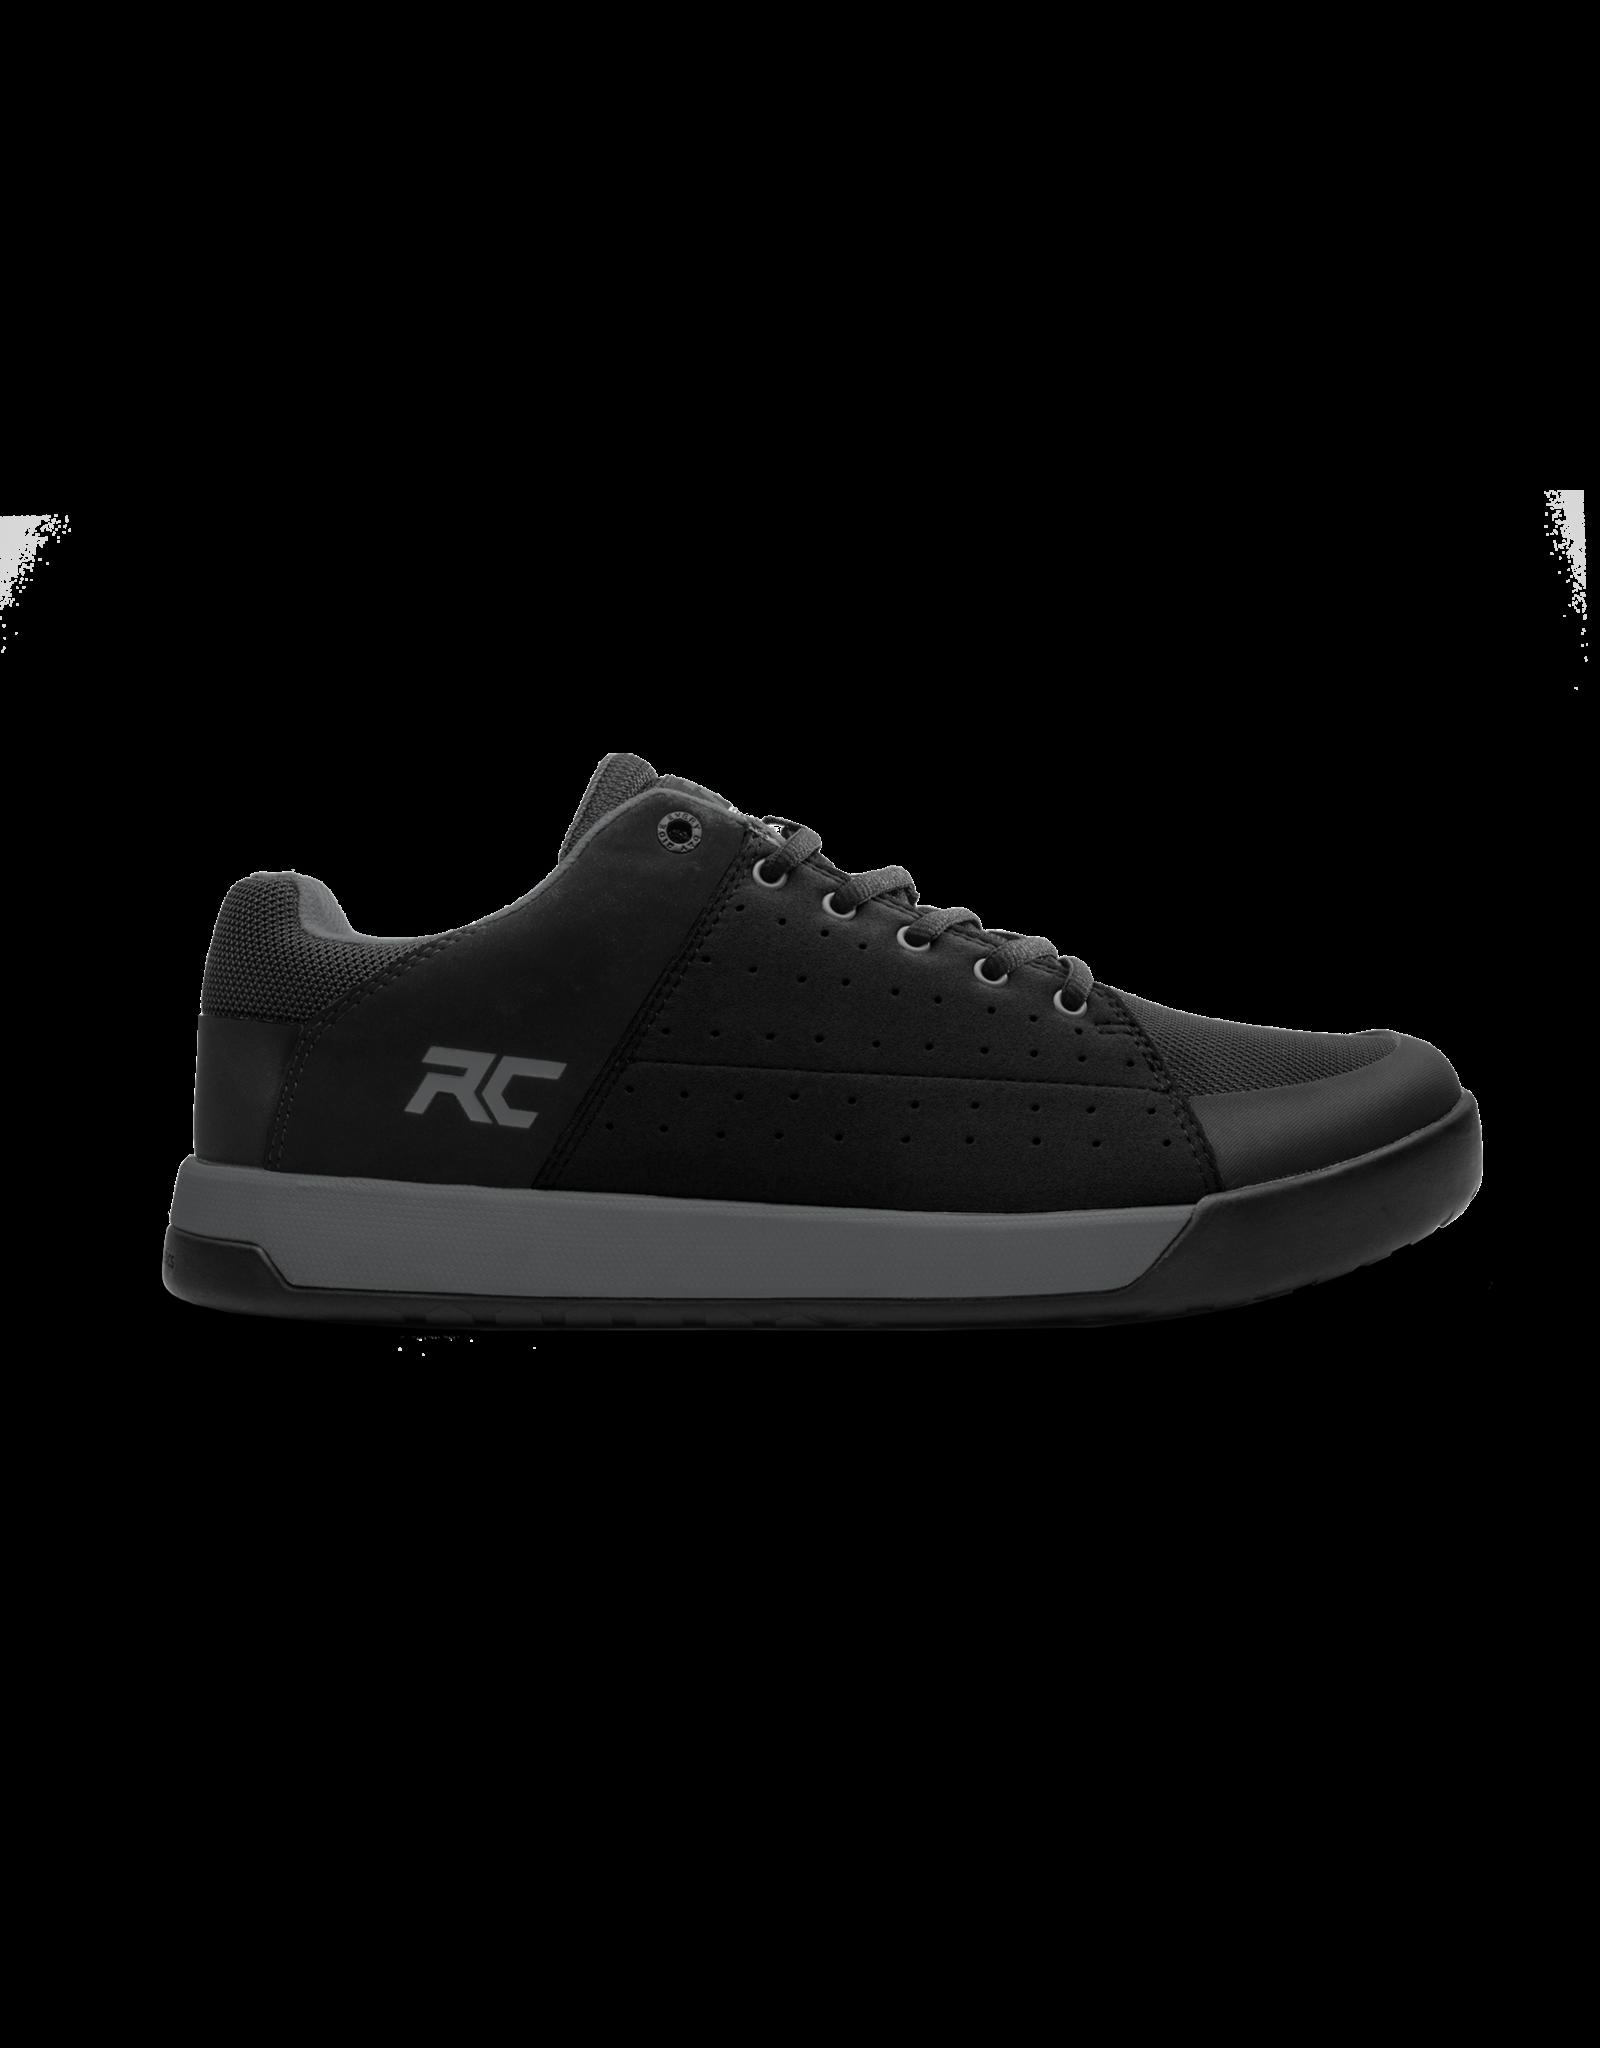 Ride Concept Ride Concept Livewire 47.0 / 13 - Char/black